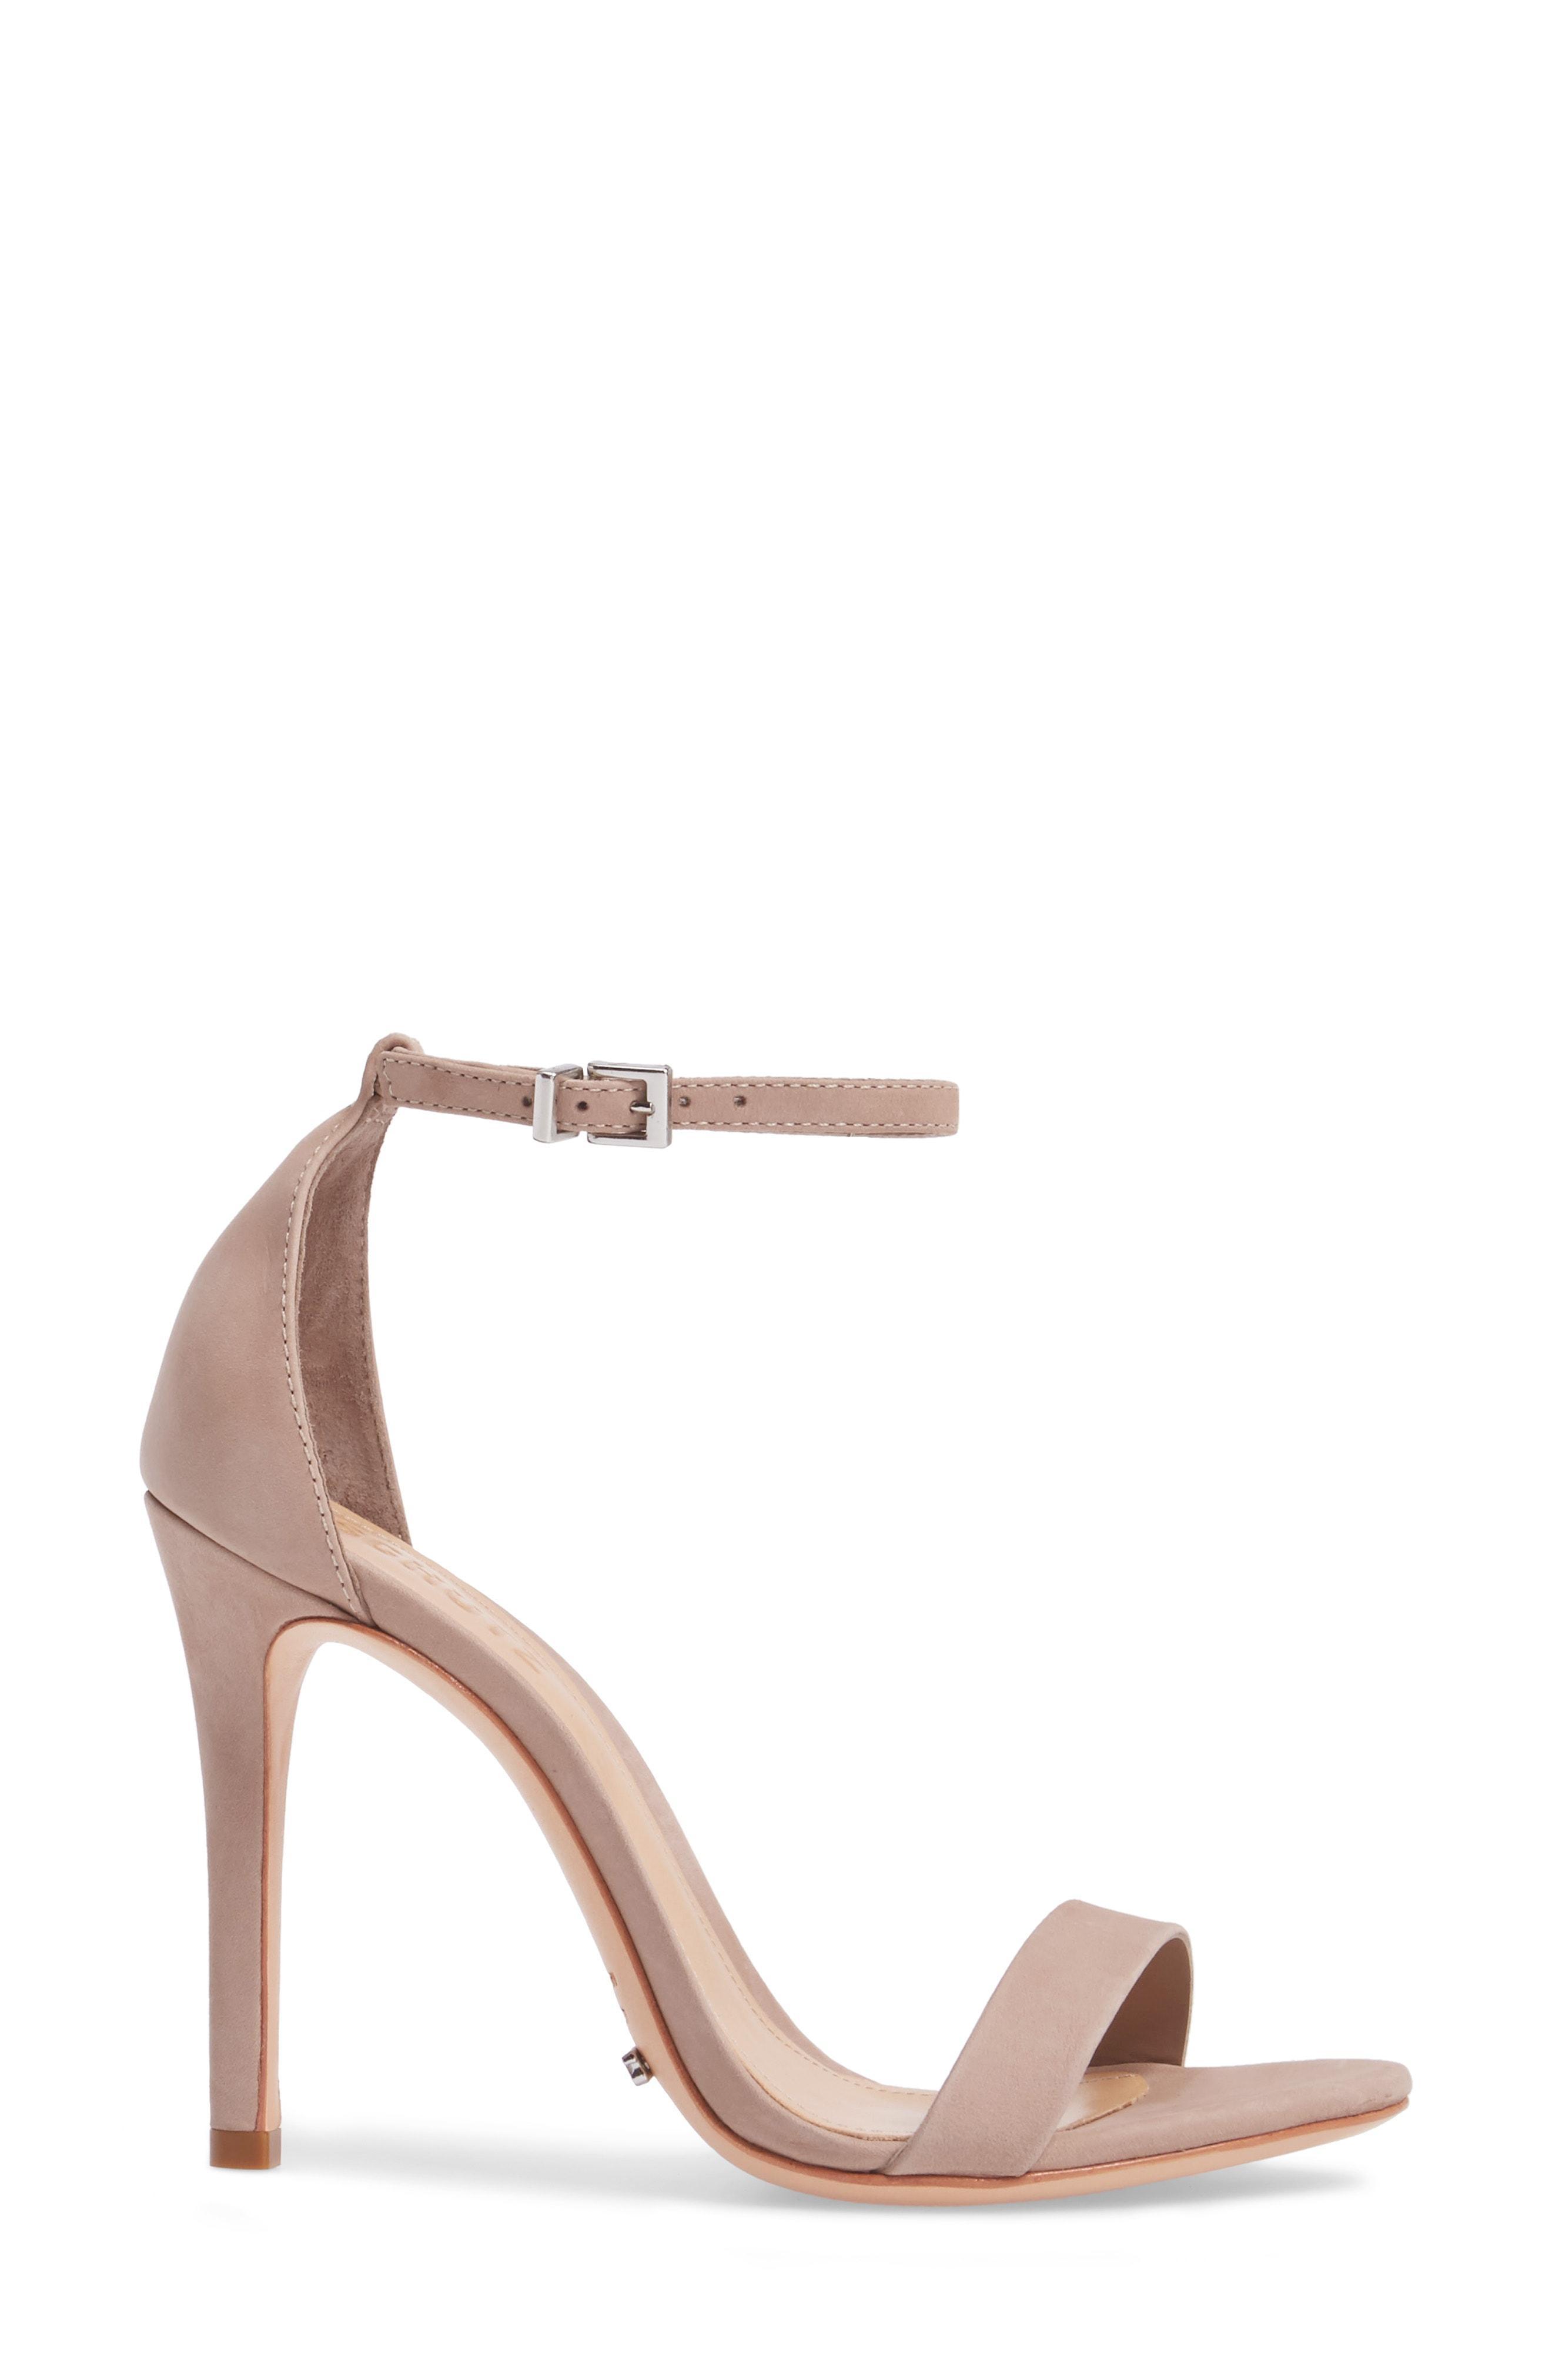 e885a7e249d Women's Cadey Lee Ankle Strap High-Heel Sandals in Neutral